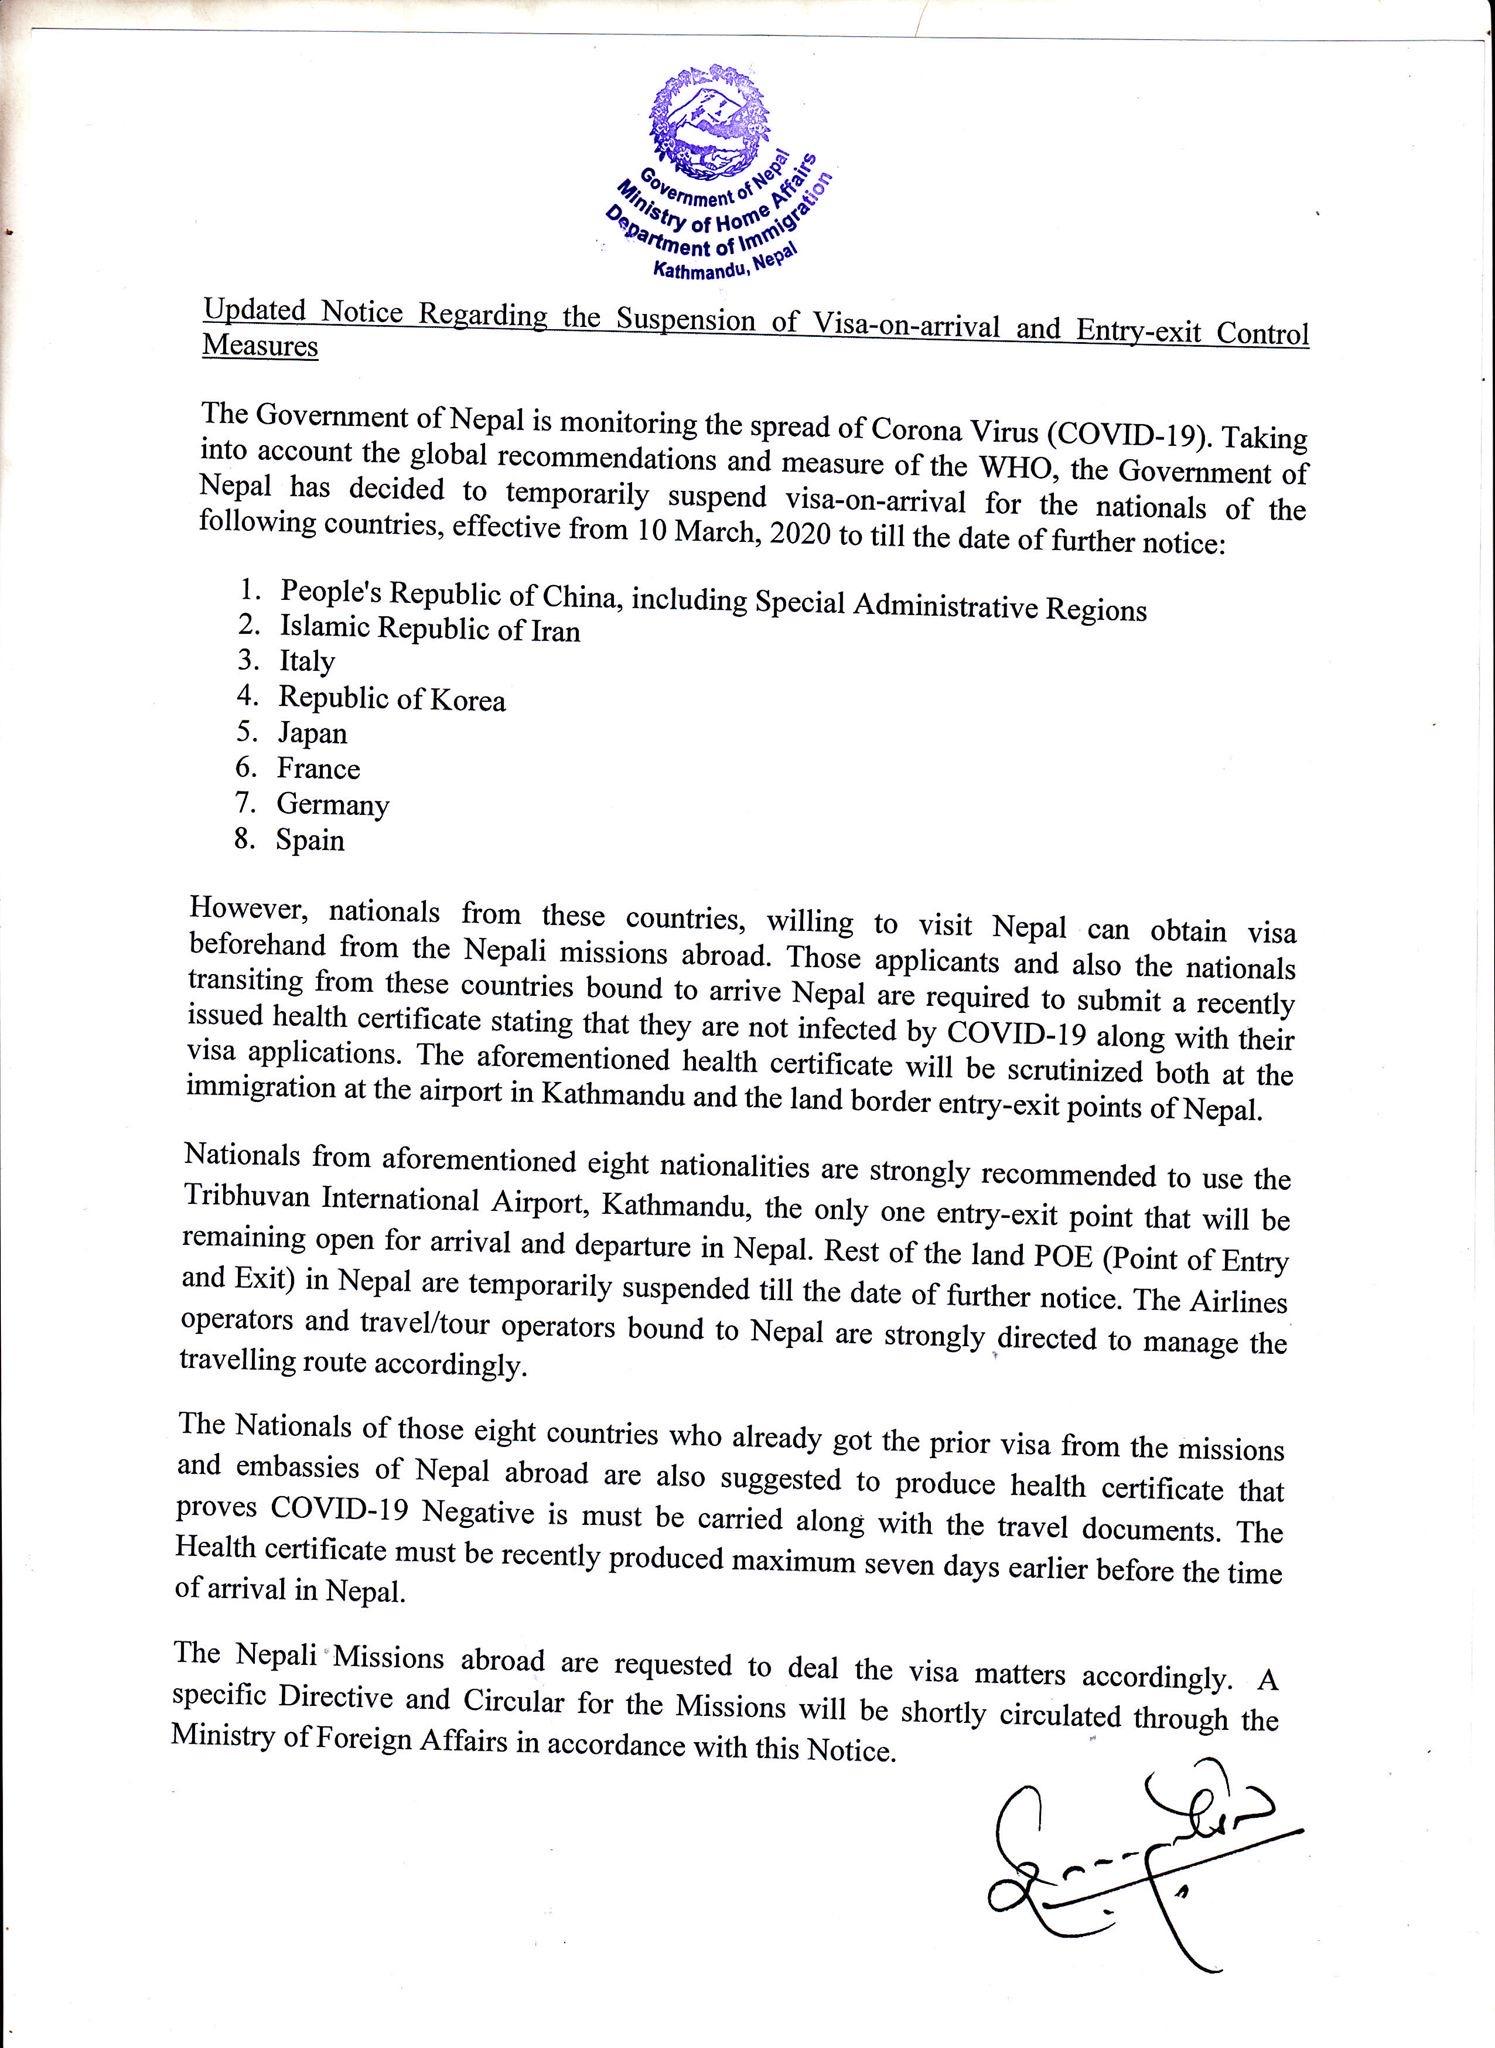 Updated Notice Regarding The Suspension Of Visa On Arrival